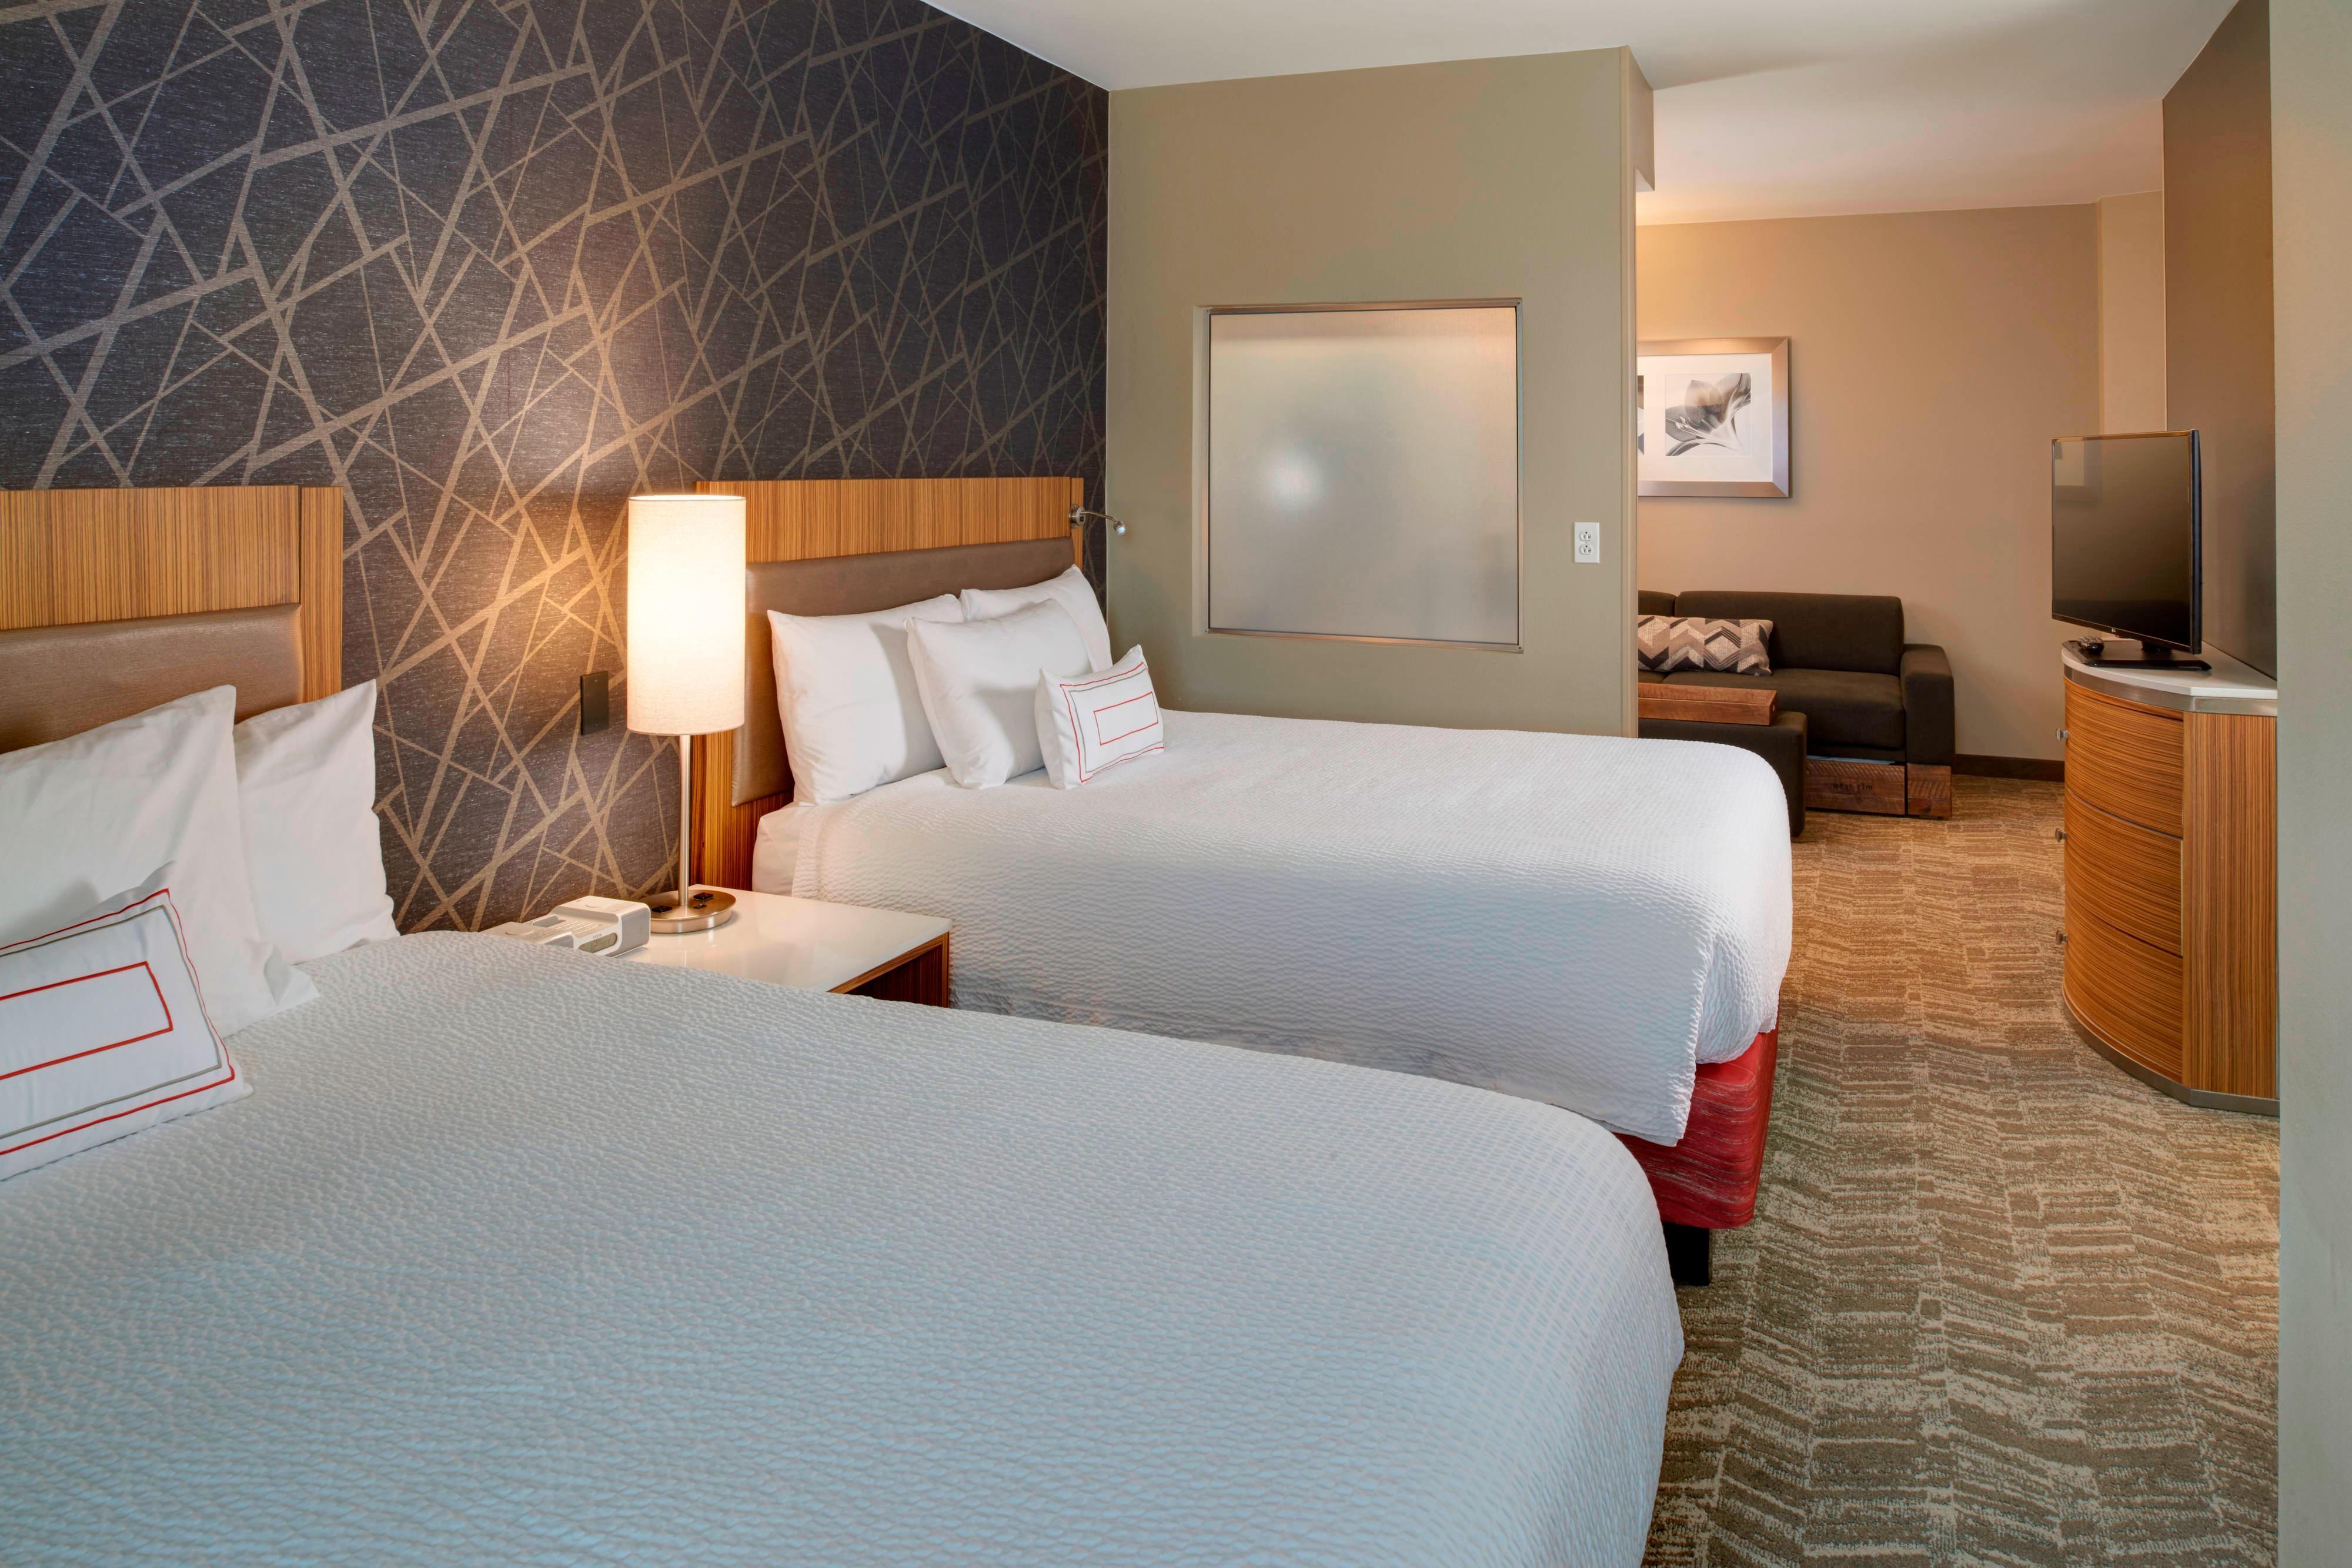 Suite mit zwei Queensize-Betten